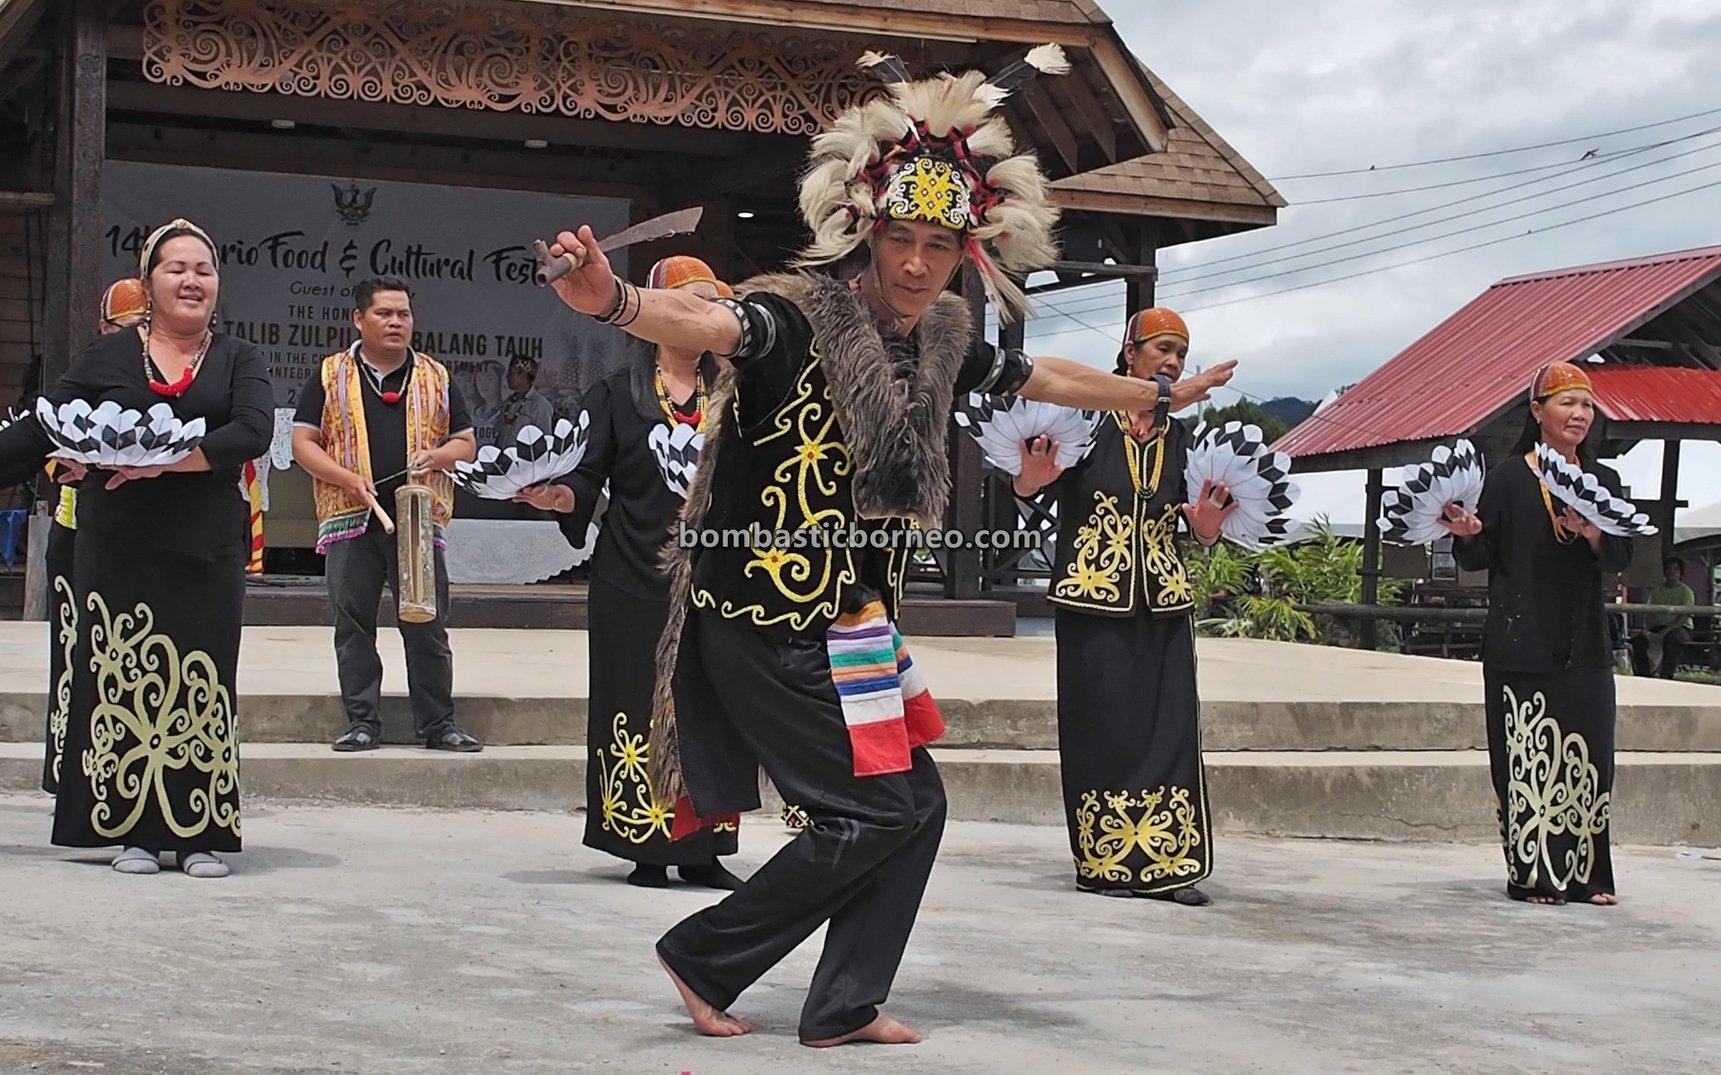 Pesta Nukenen, Bario Food Cultural Festival, traditional dance, authentic, destination, exploration, Dayak, Orang Ulu, tribe, Highlands, travel guide, Borneo, 婆罗洲达雅传统舞蹈, 砂拉越乌鲁人部落, 巴里奥加拉毕族文化,